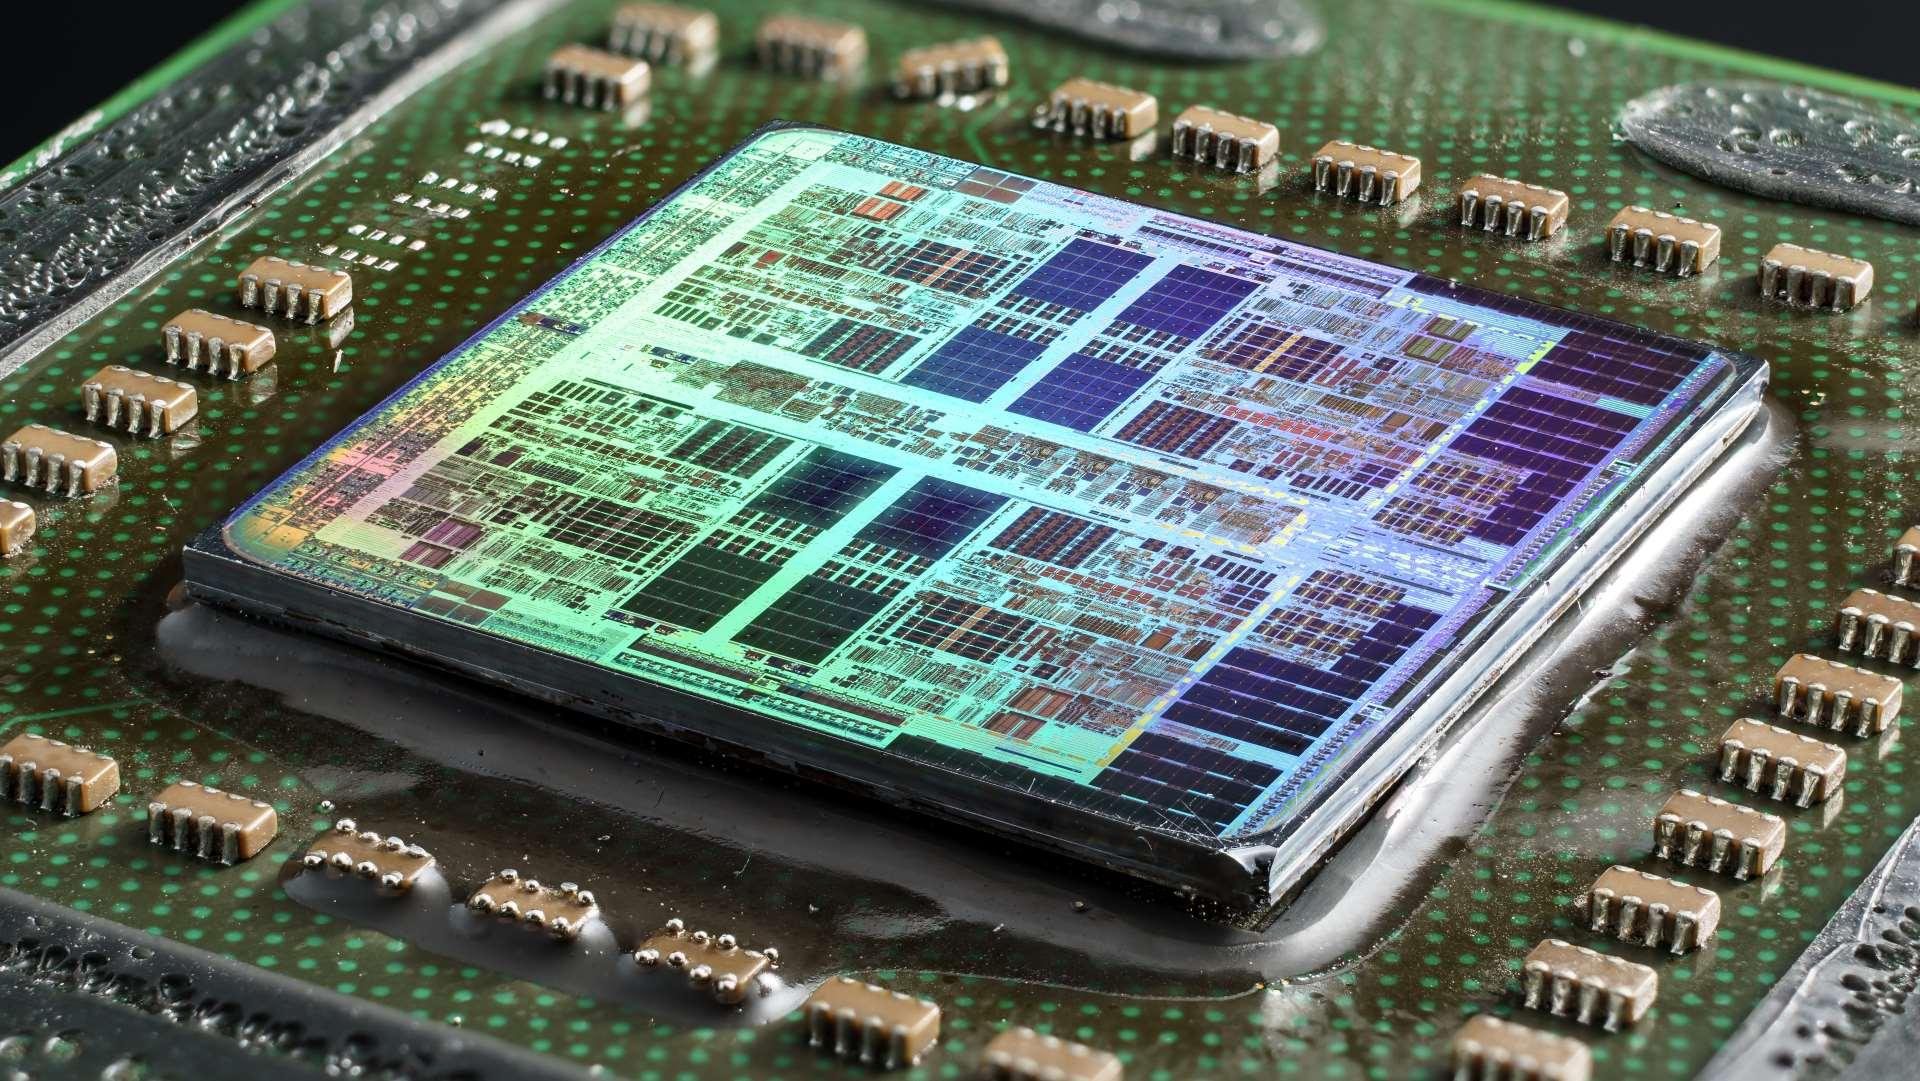 Google's revolutionary Stadia tech is built on custom AMD GPUs